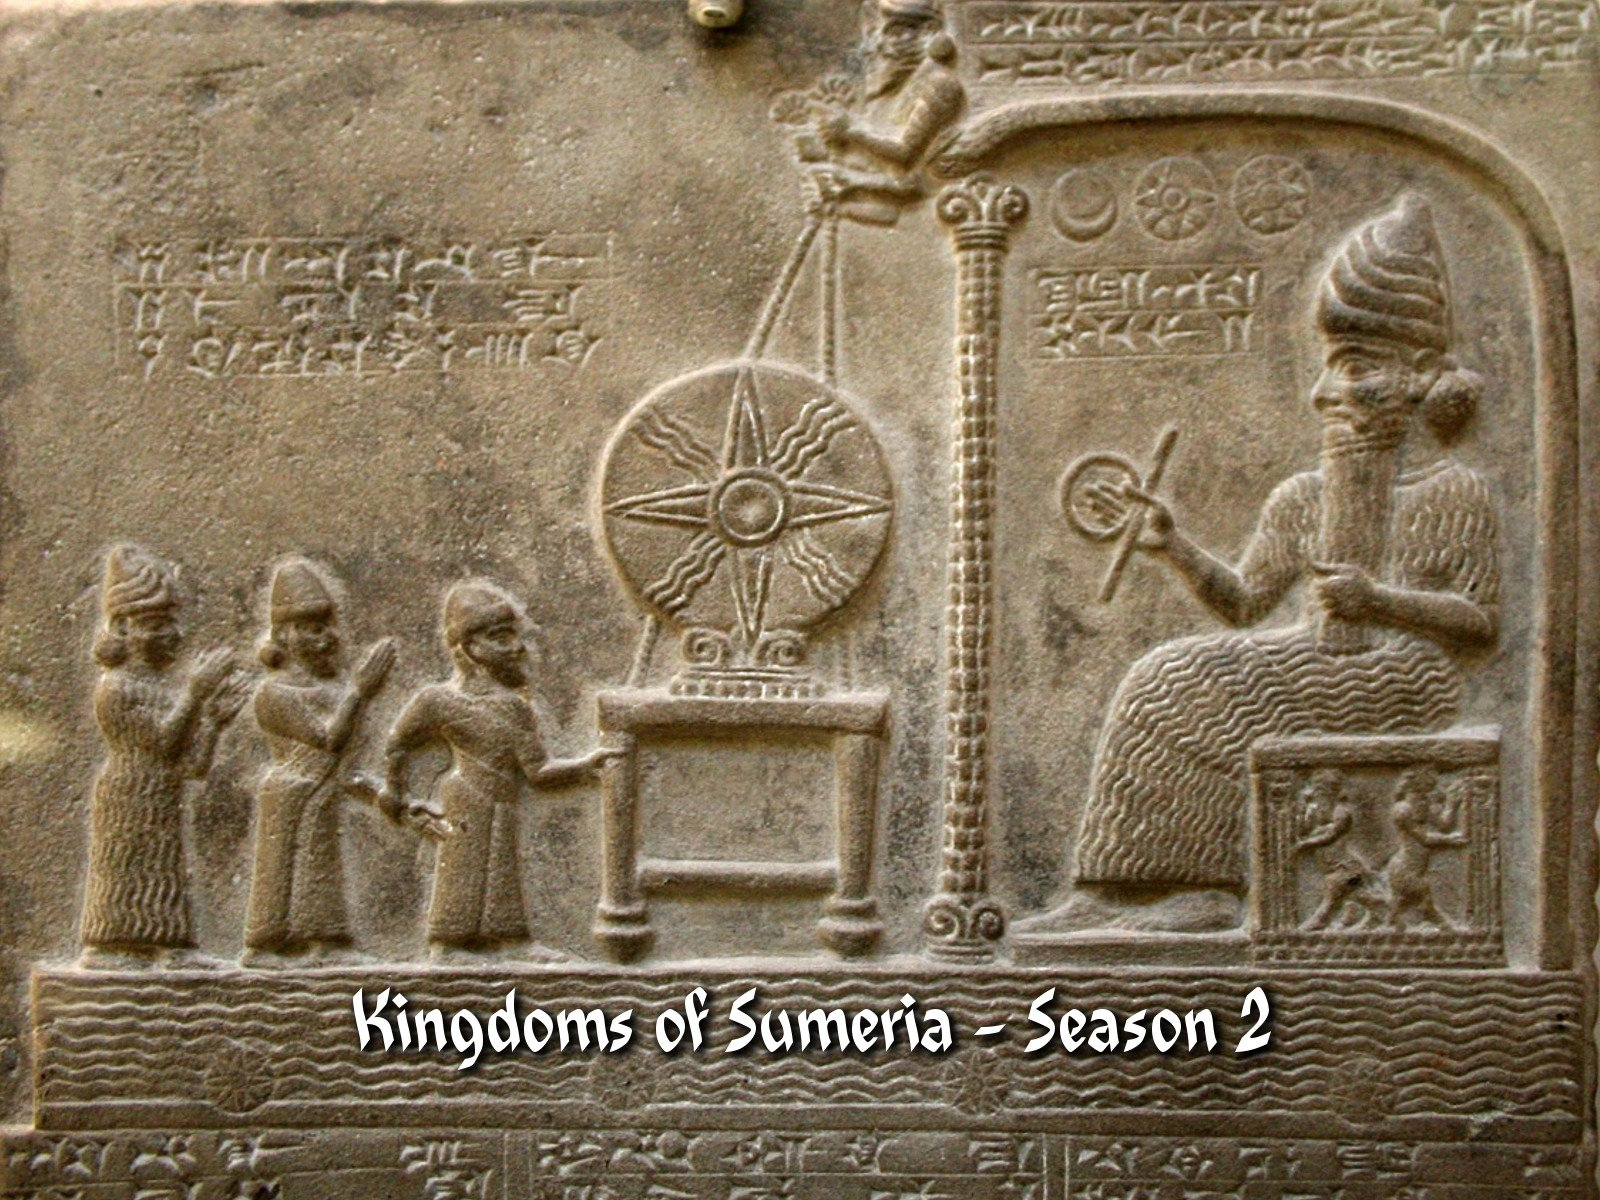 Amazoncom Watch Kingdoms of Sumeria Prime Video 1600x1200